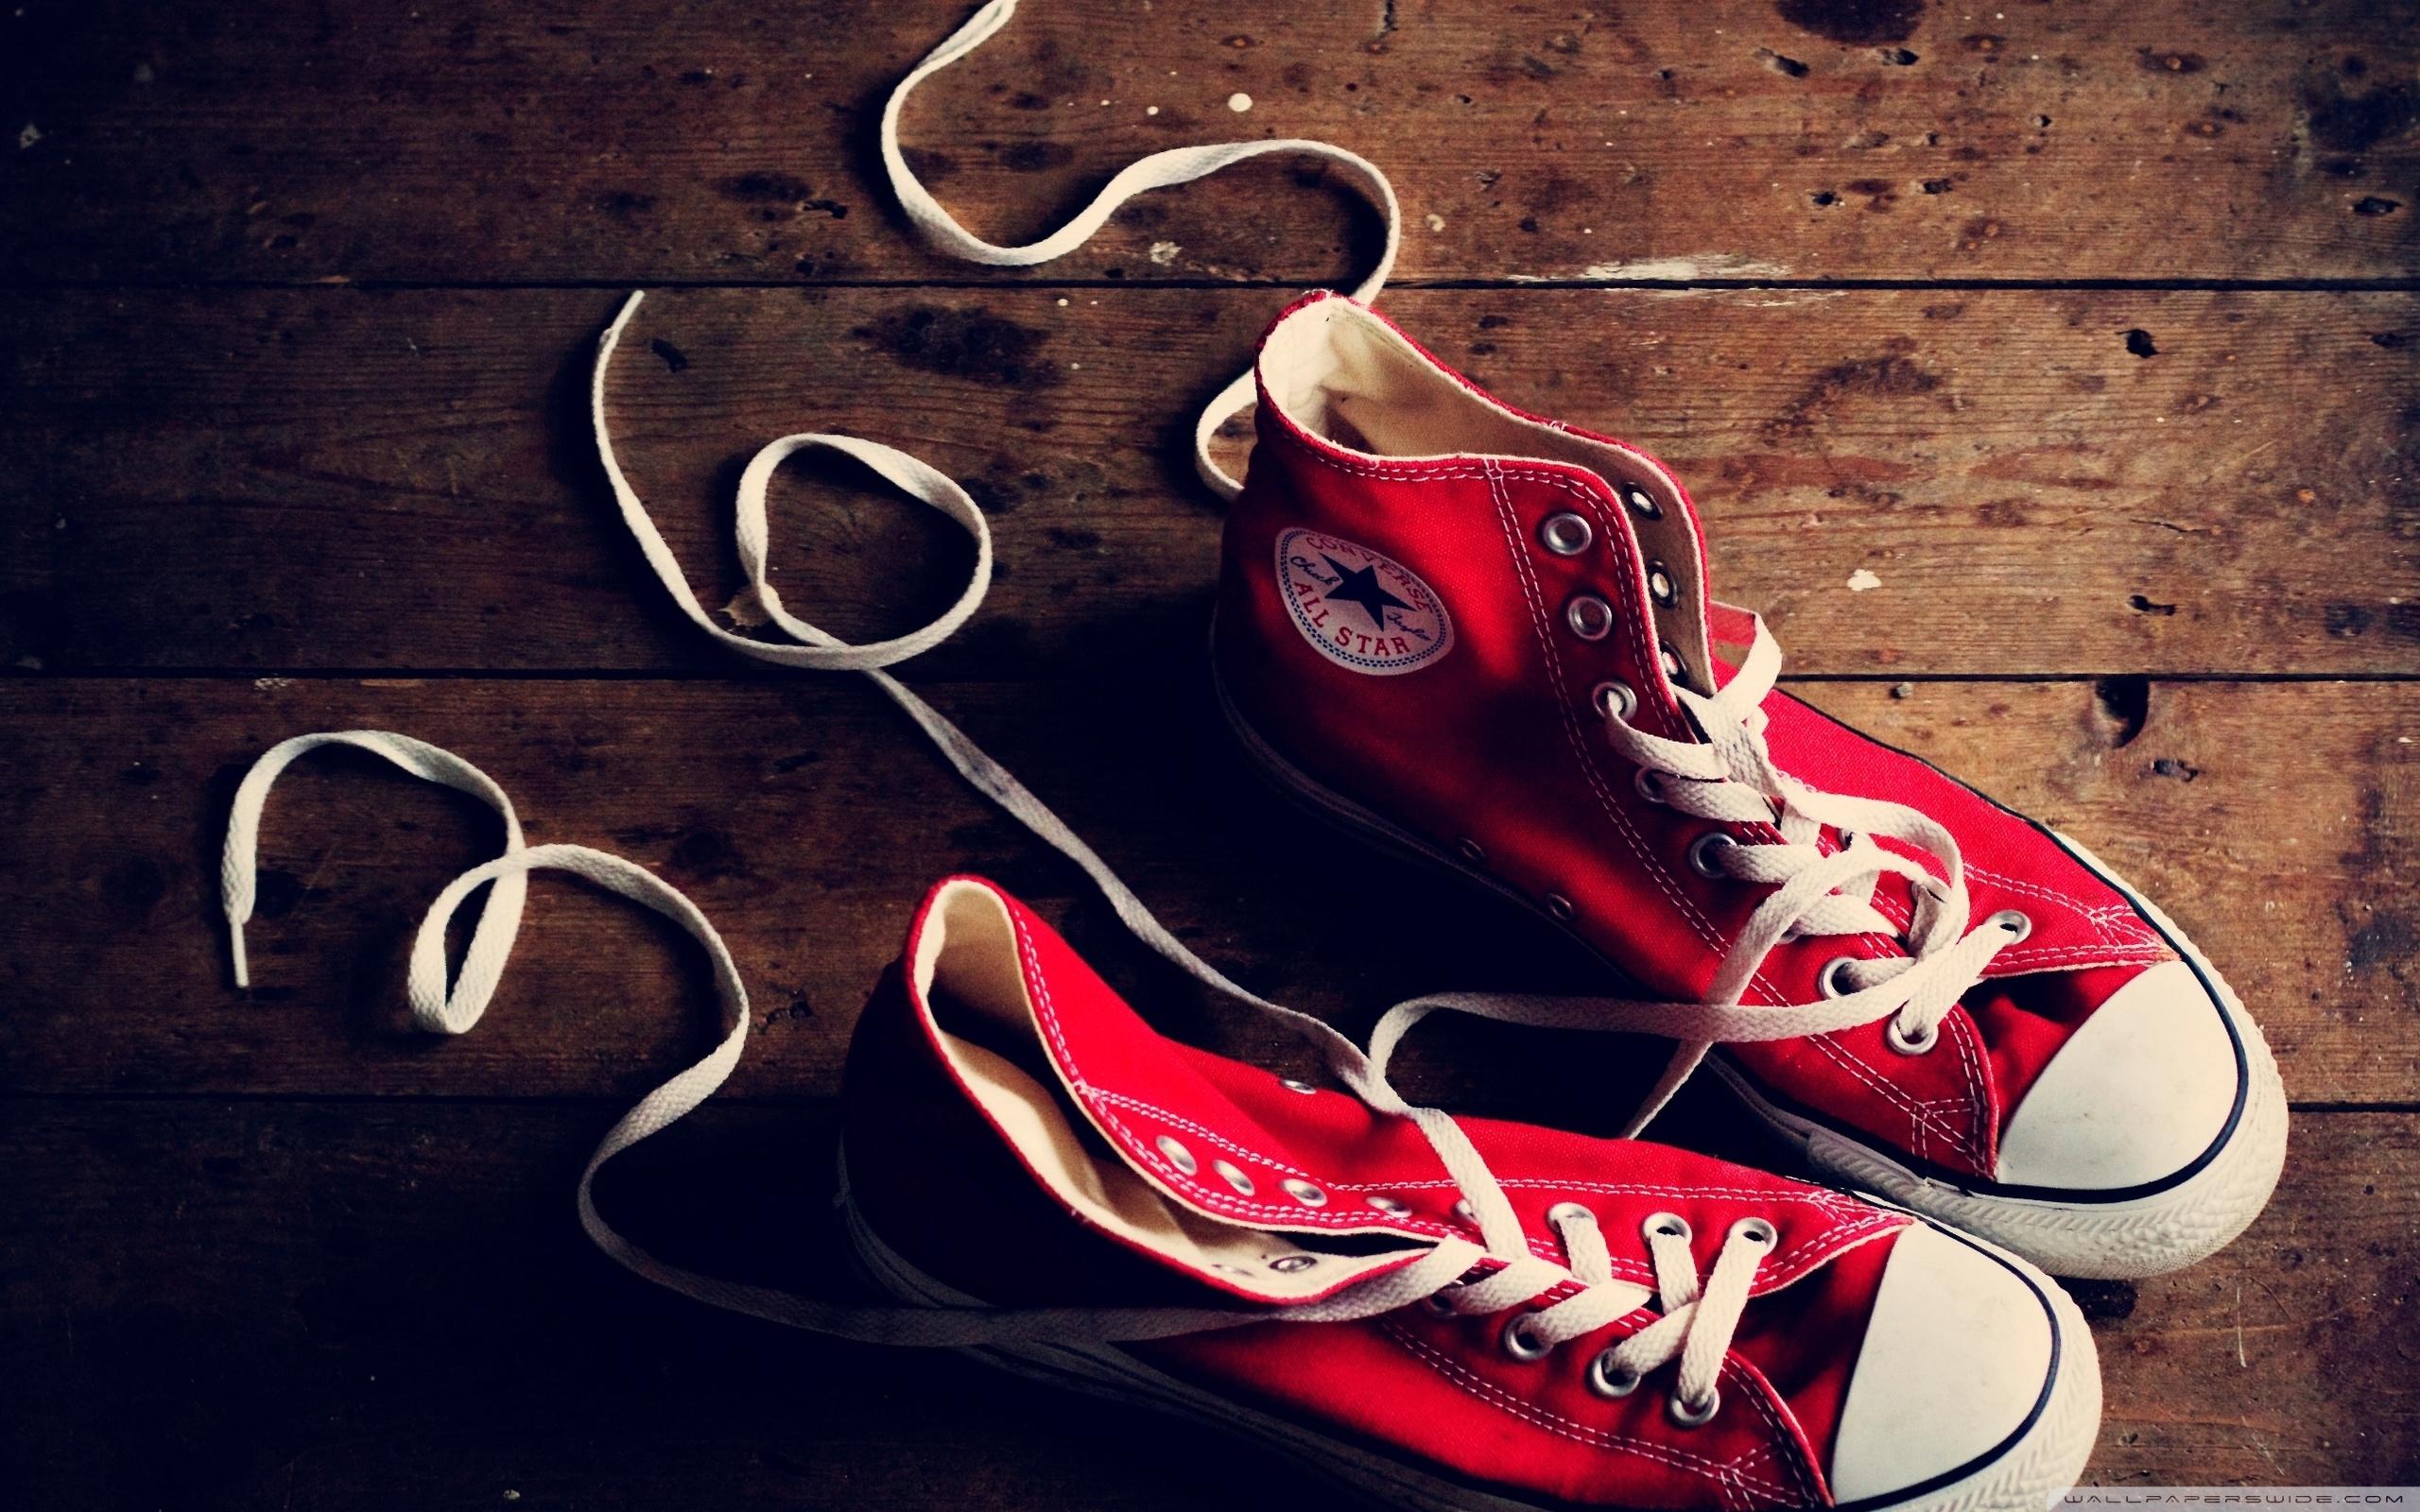 Converse Shoes Wallpaper